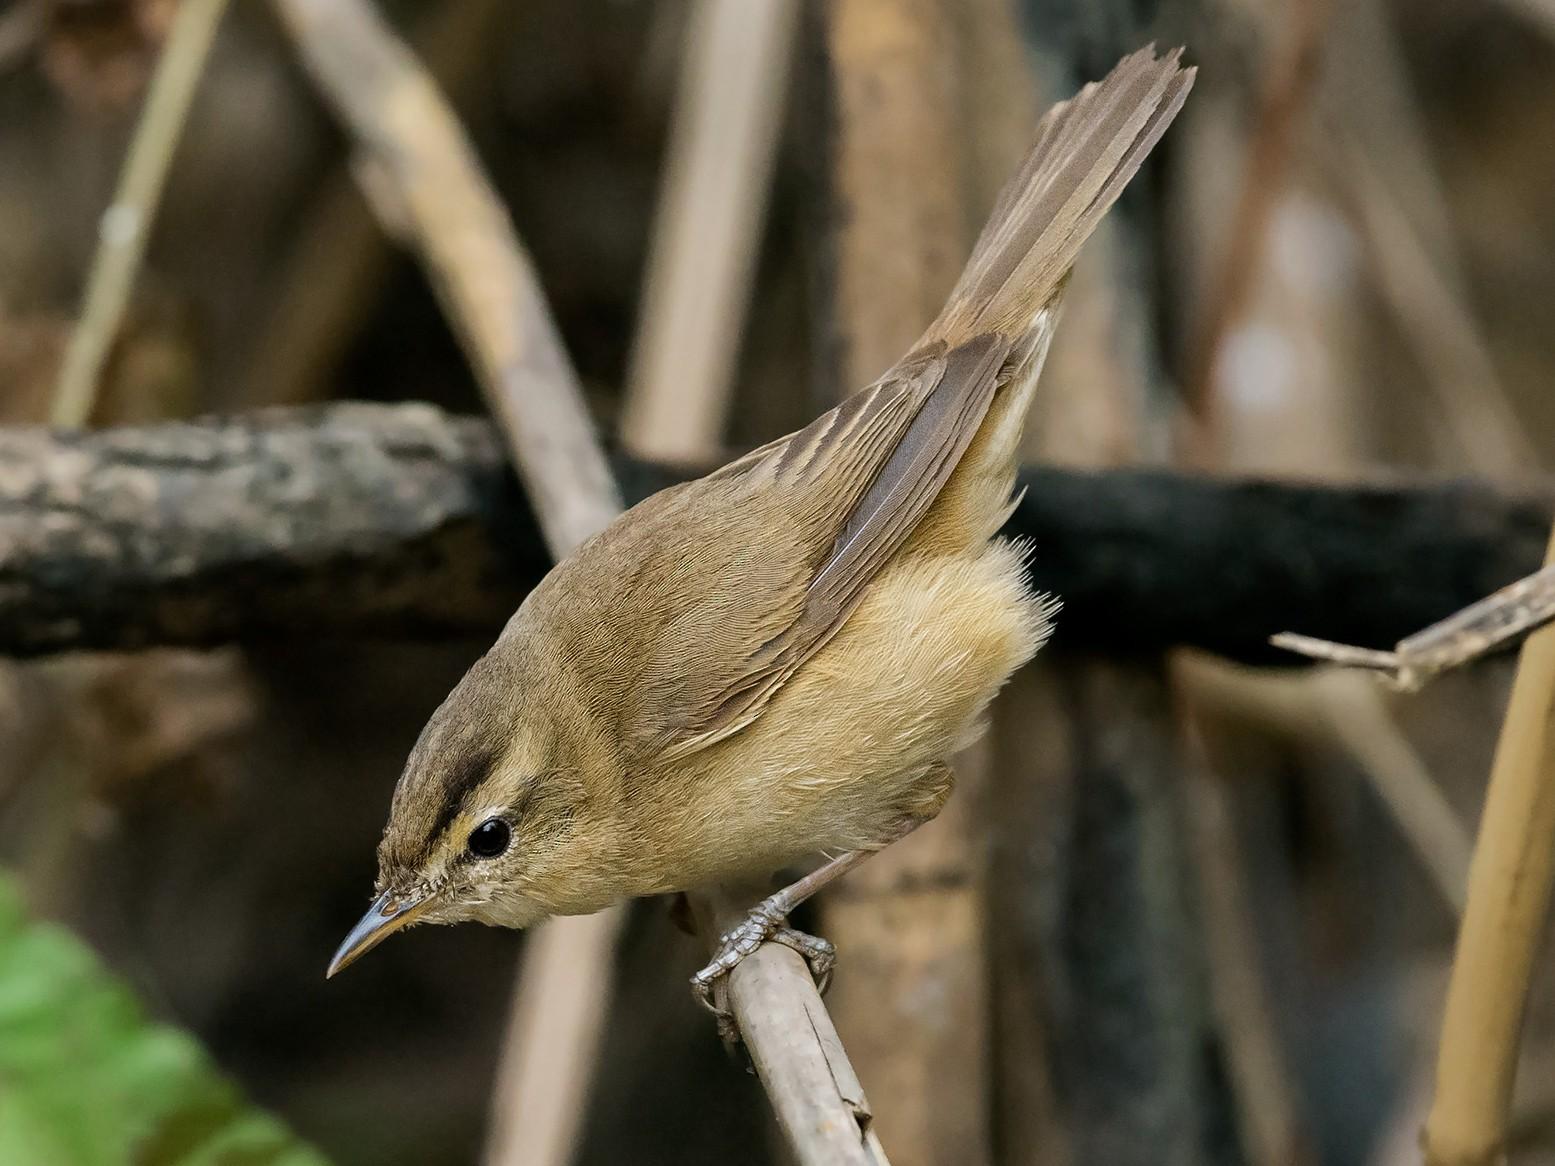 Black-browed Reed Warbler - Natthaphat Chotjuckdikul